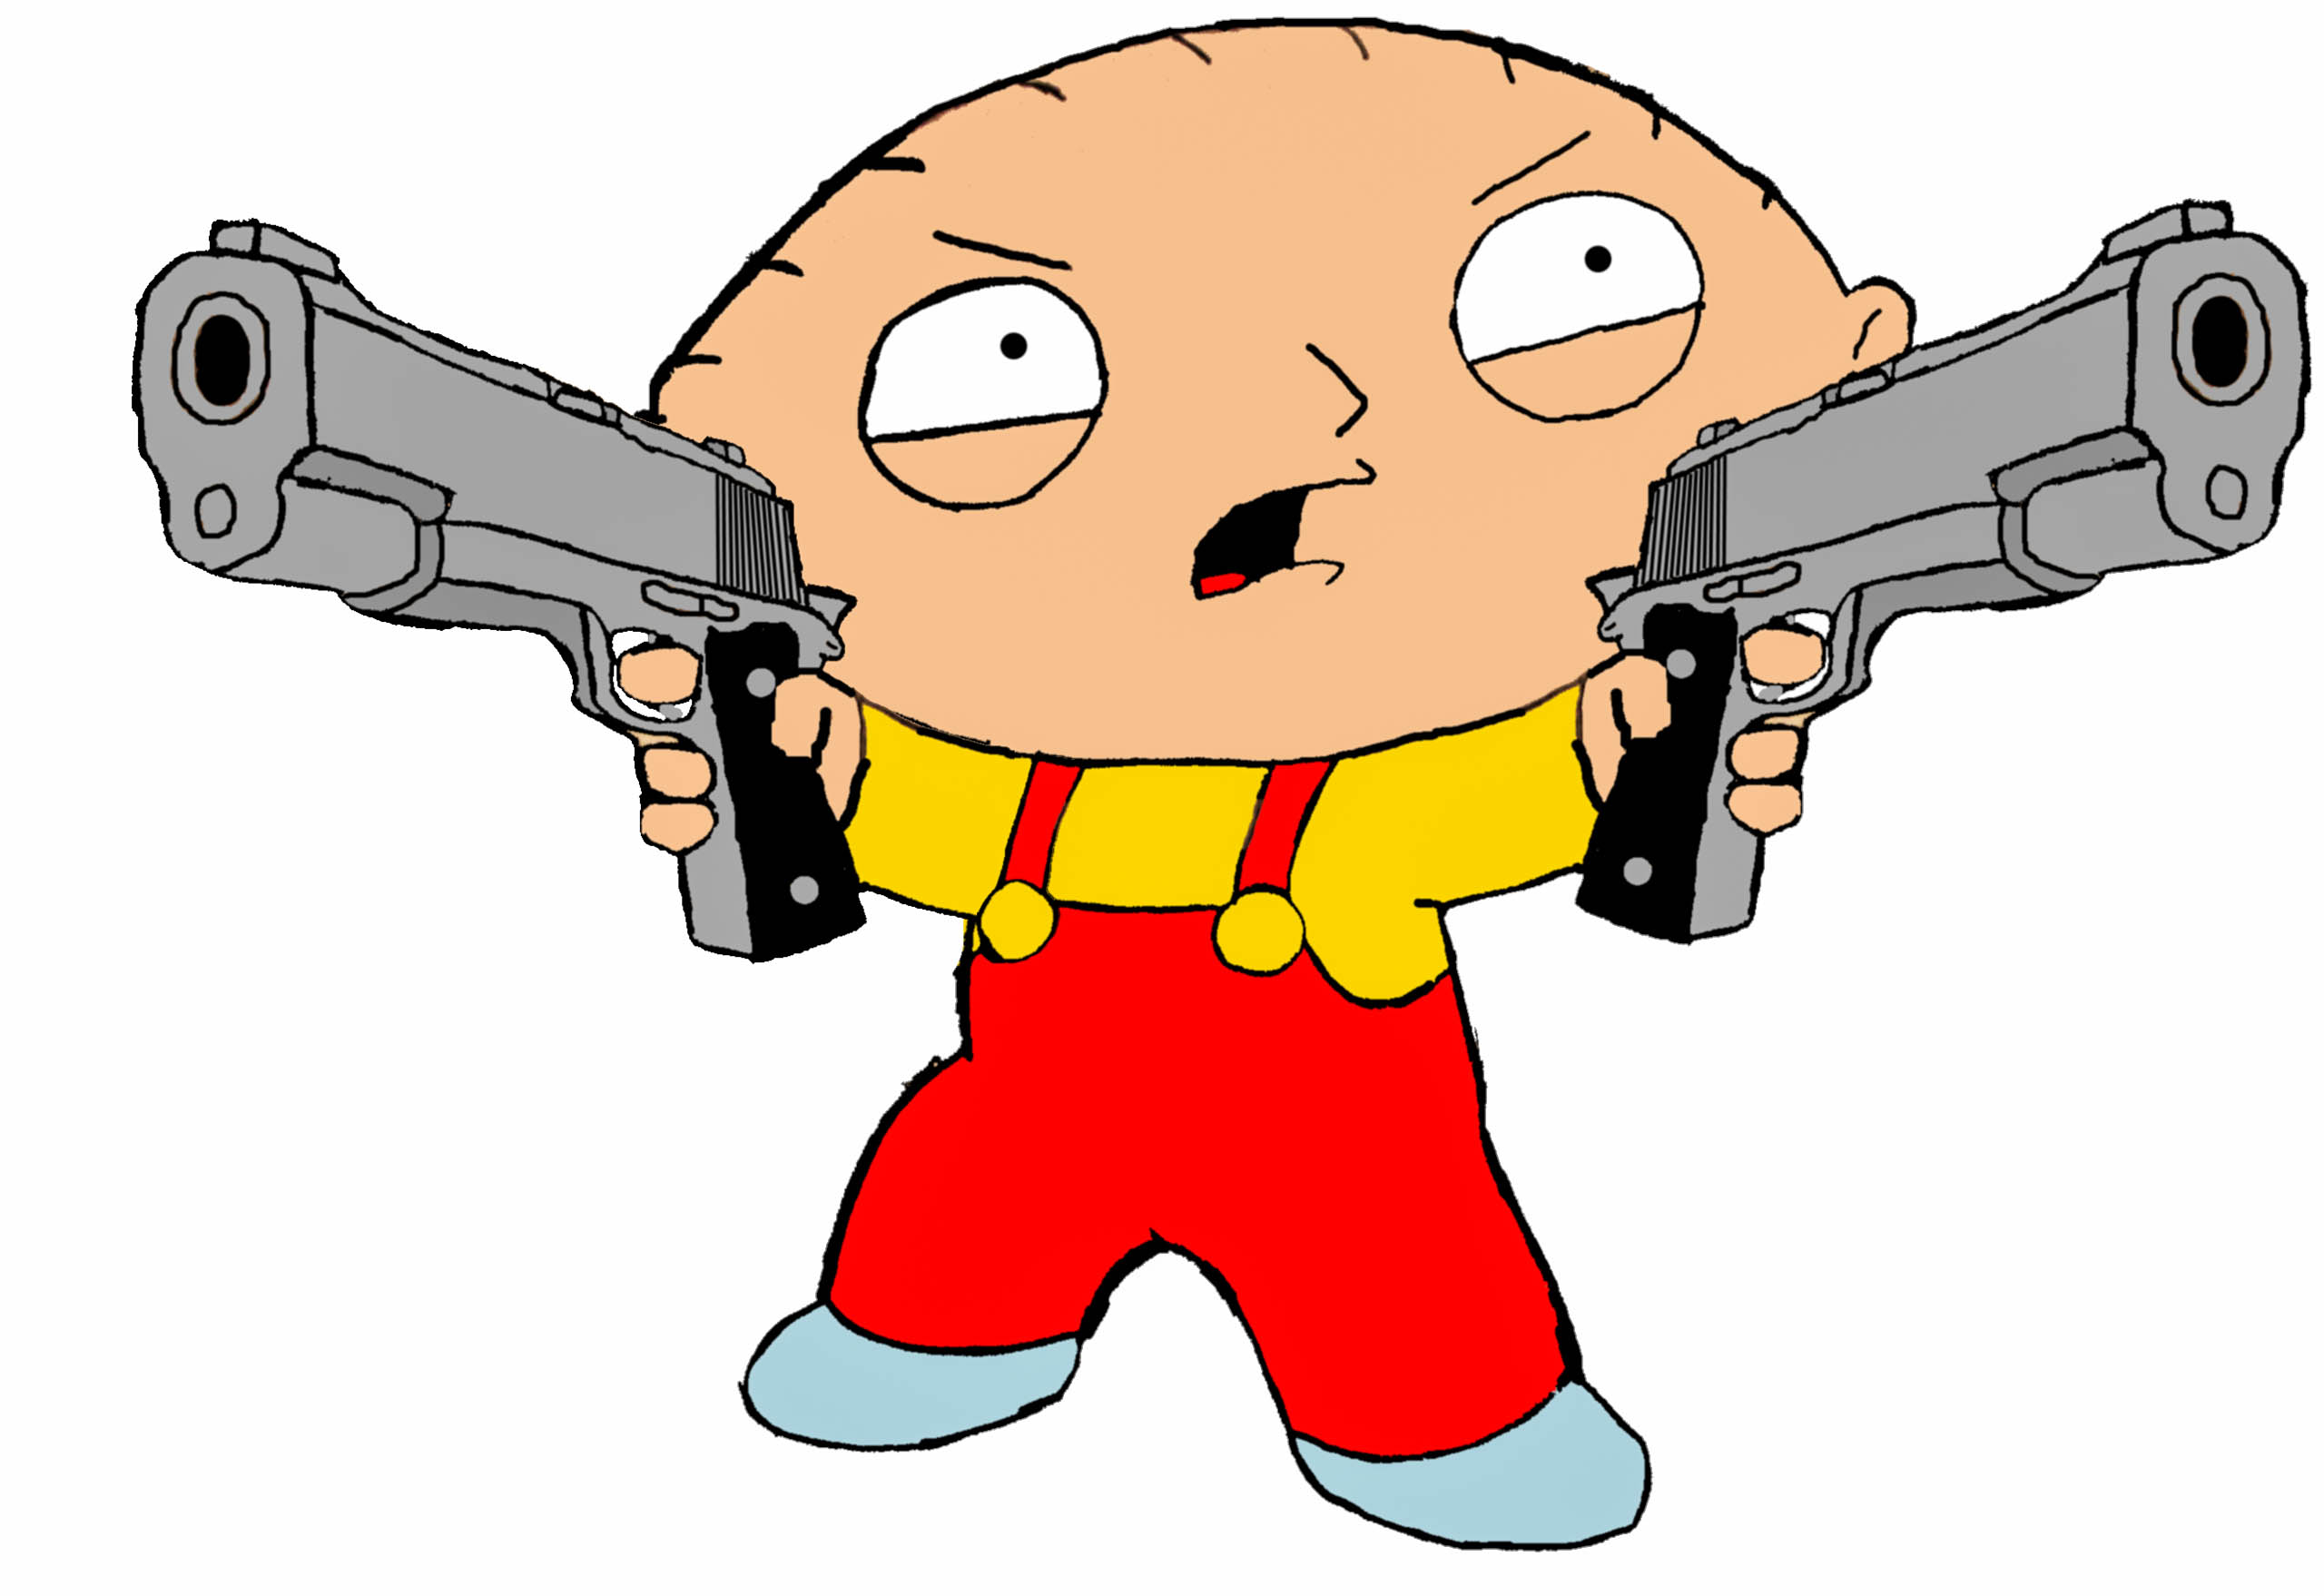 25] Family Guy Supreme Wallpapers on WallpaperSafari 2560x1758